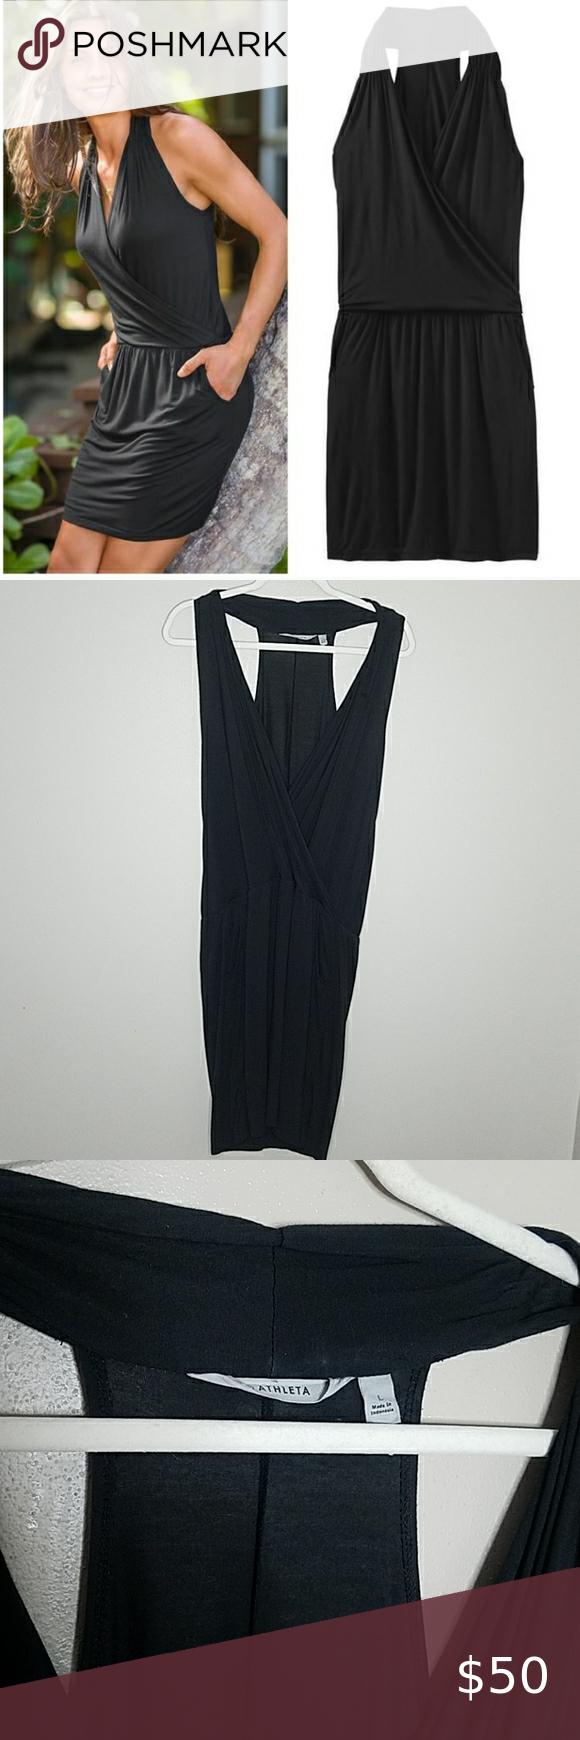 Athleta Crosstown Dress, Size Large Athleta Crosstown Dress, Size L in Black Faux Wrap, Pockets, Sleeveless, Plunge V-neck.  94% Modal, 6% Spandex.  Measures approximately 39.5